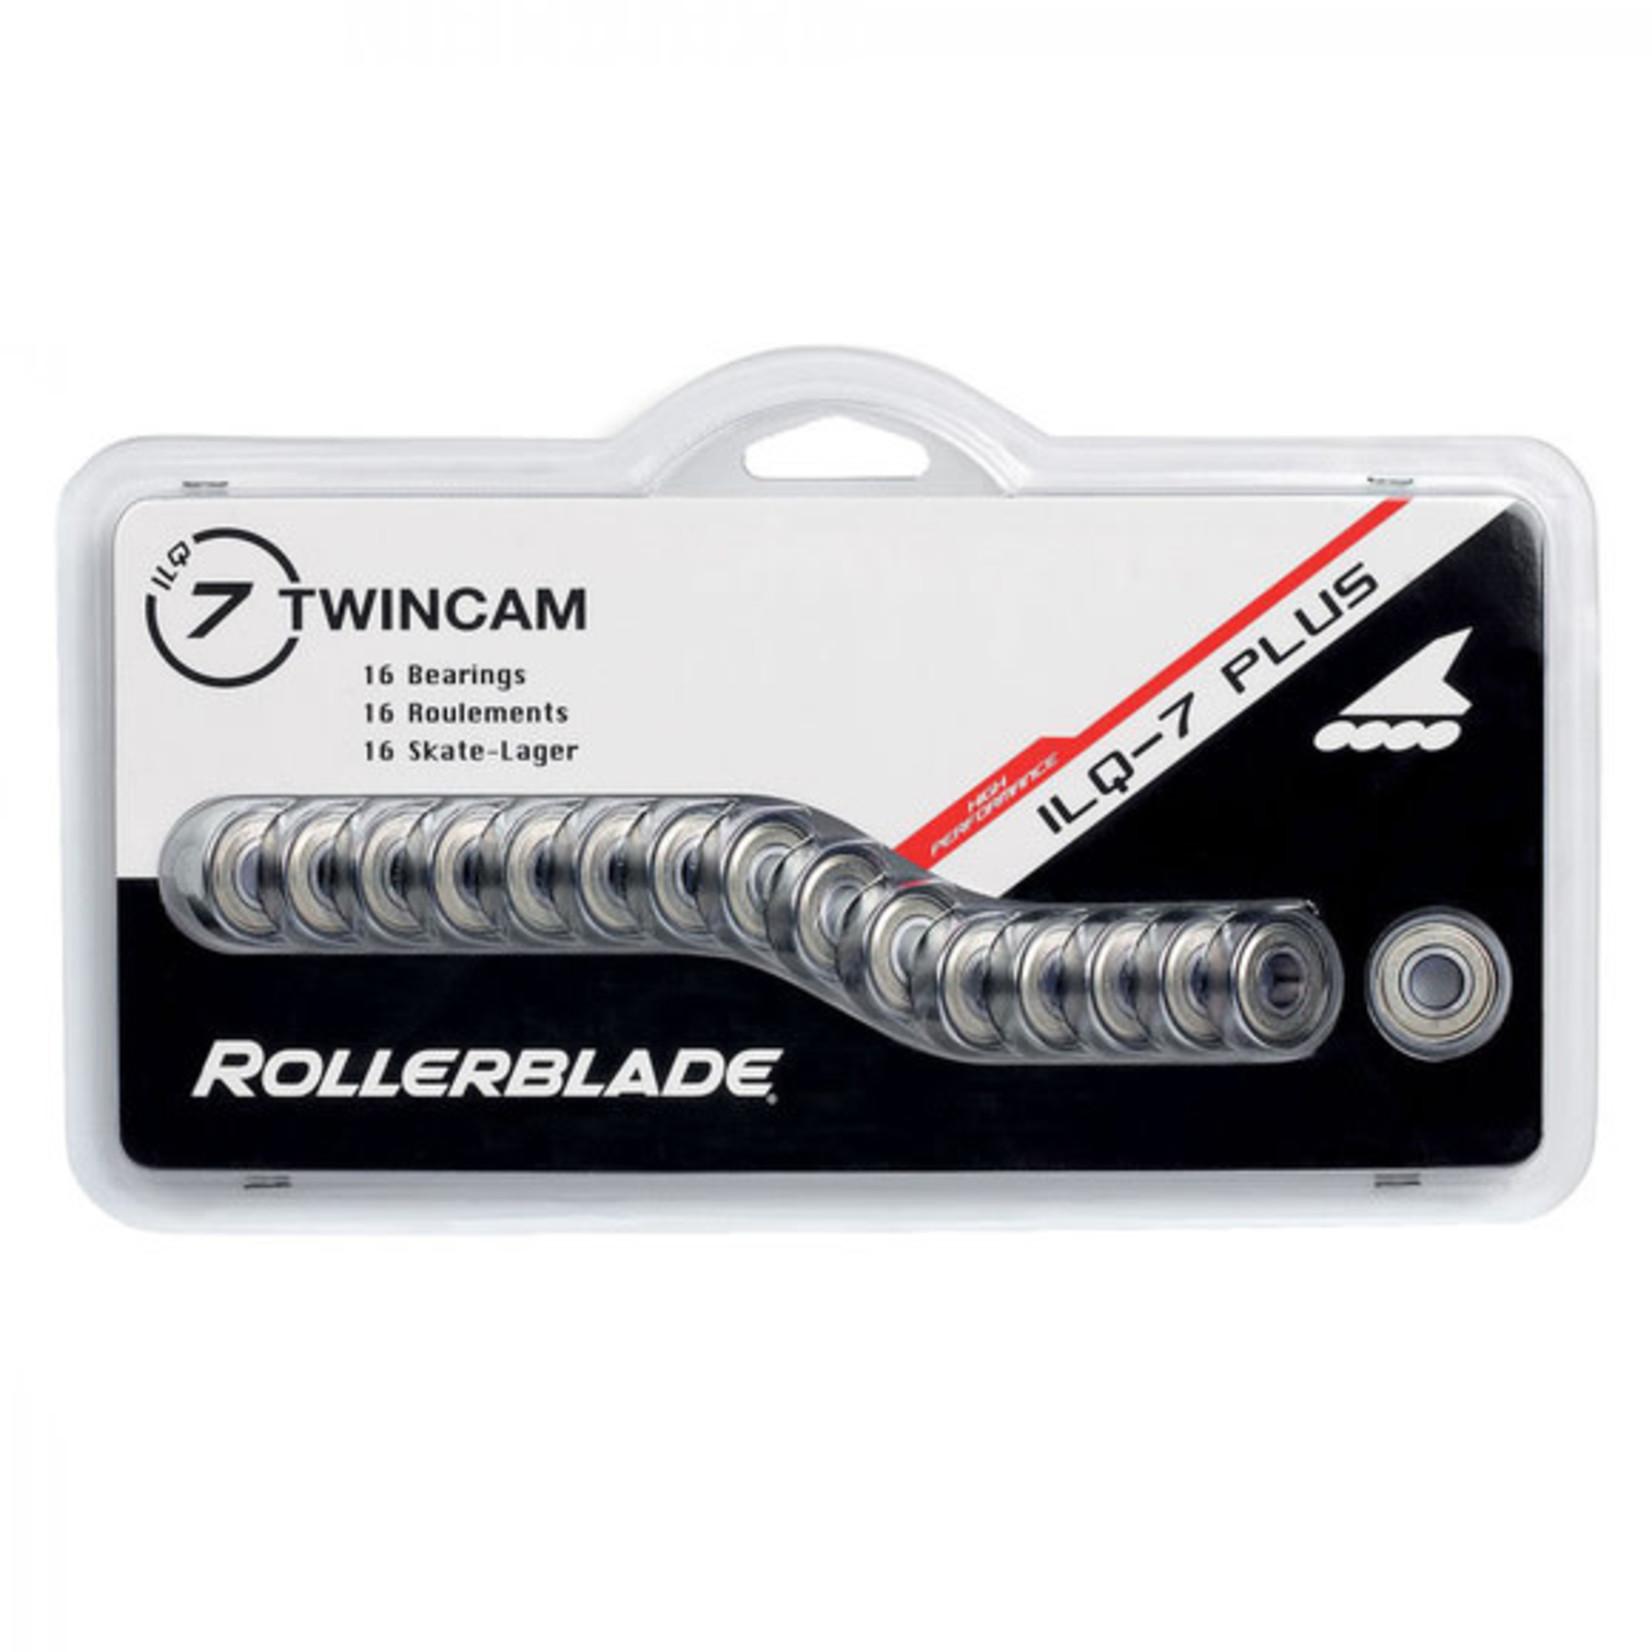 Rollerblade Ensemble de 16 Bearings Rollerblade ILQ-7 Plus